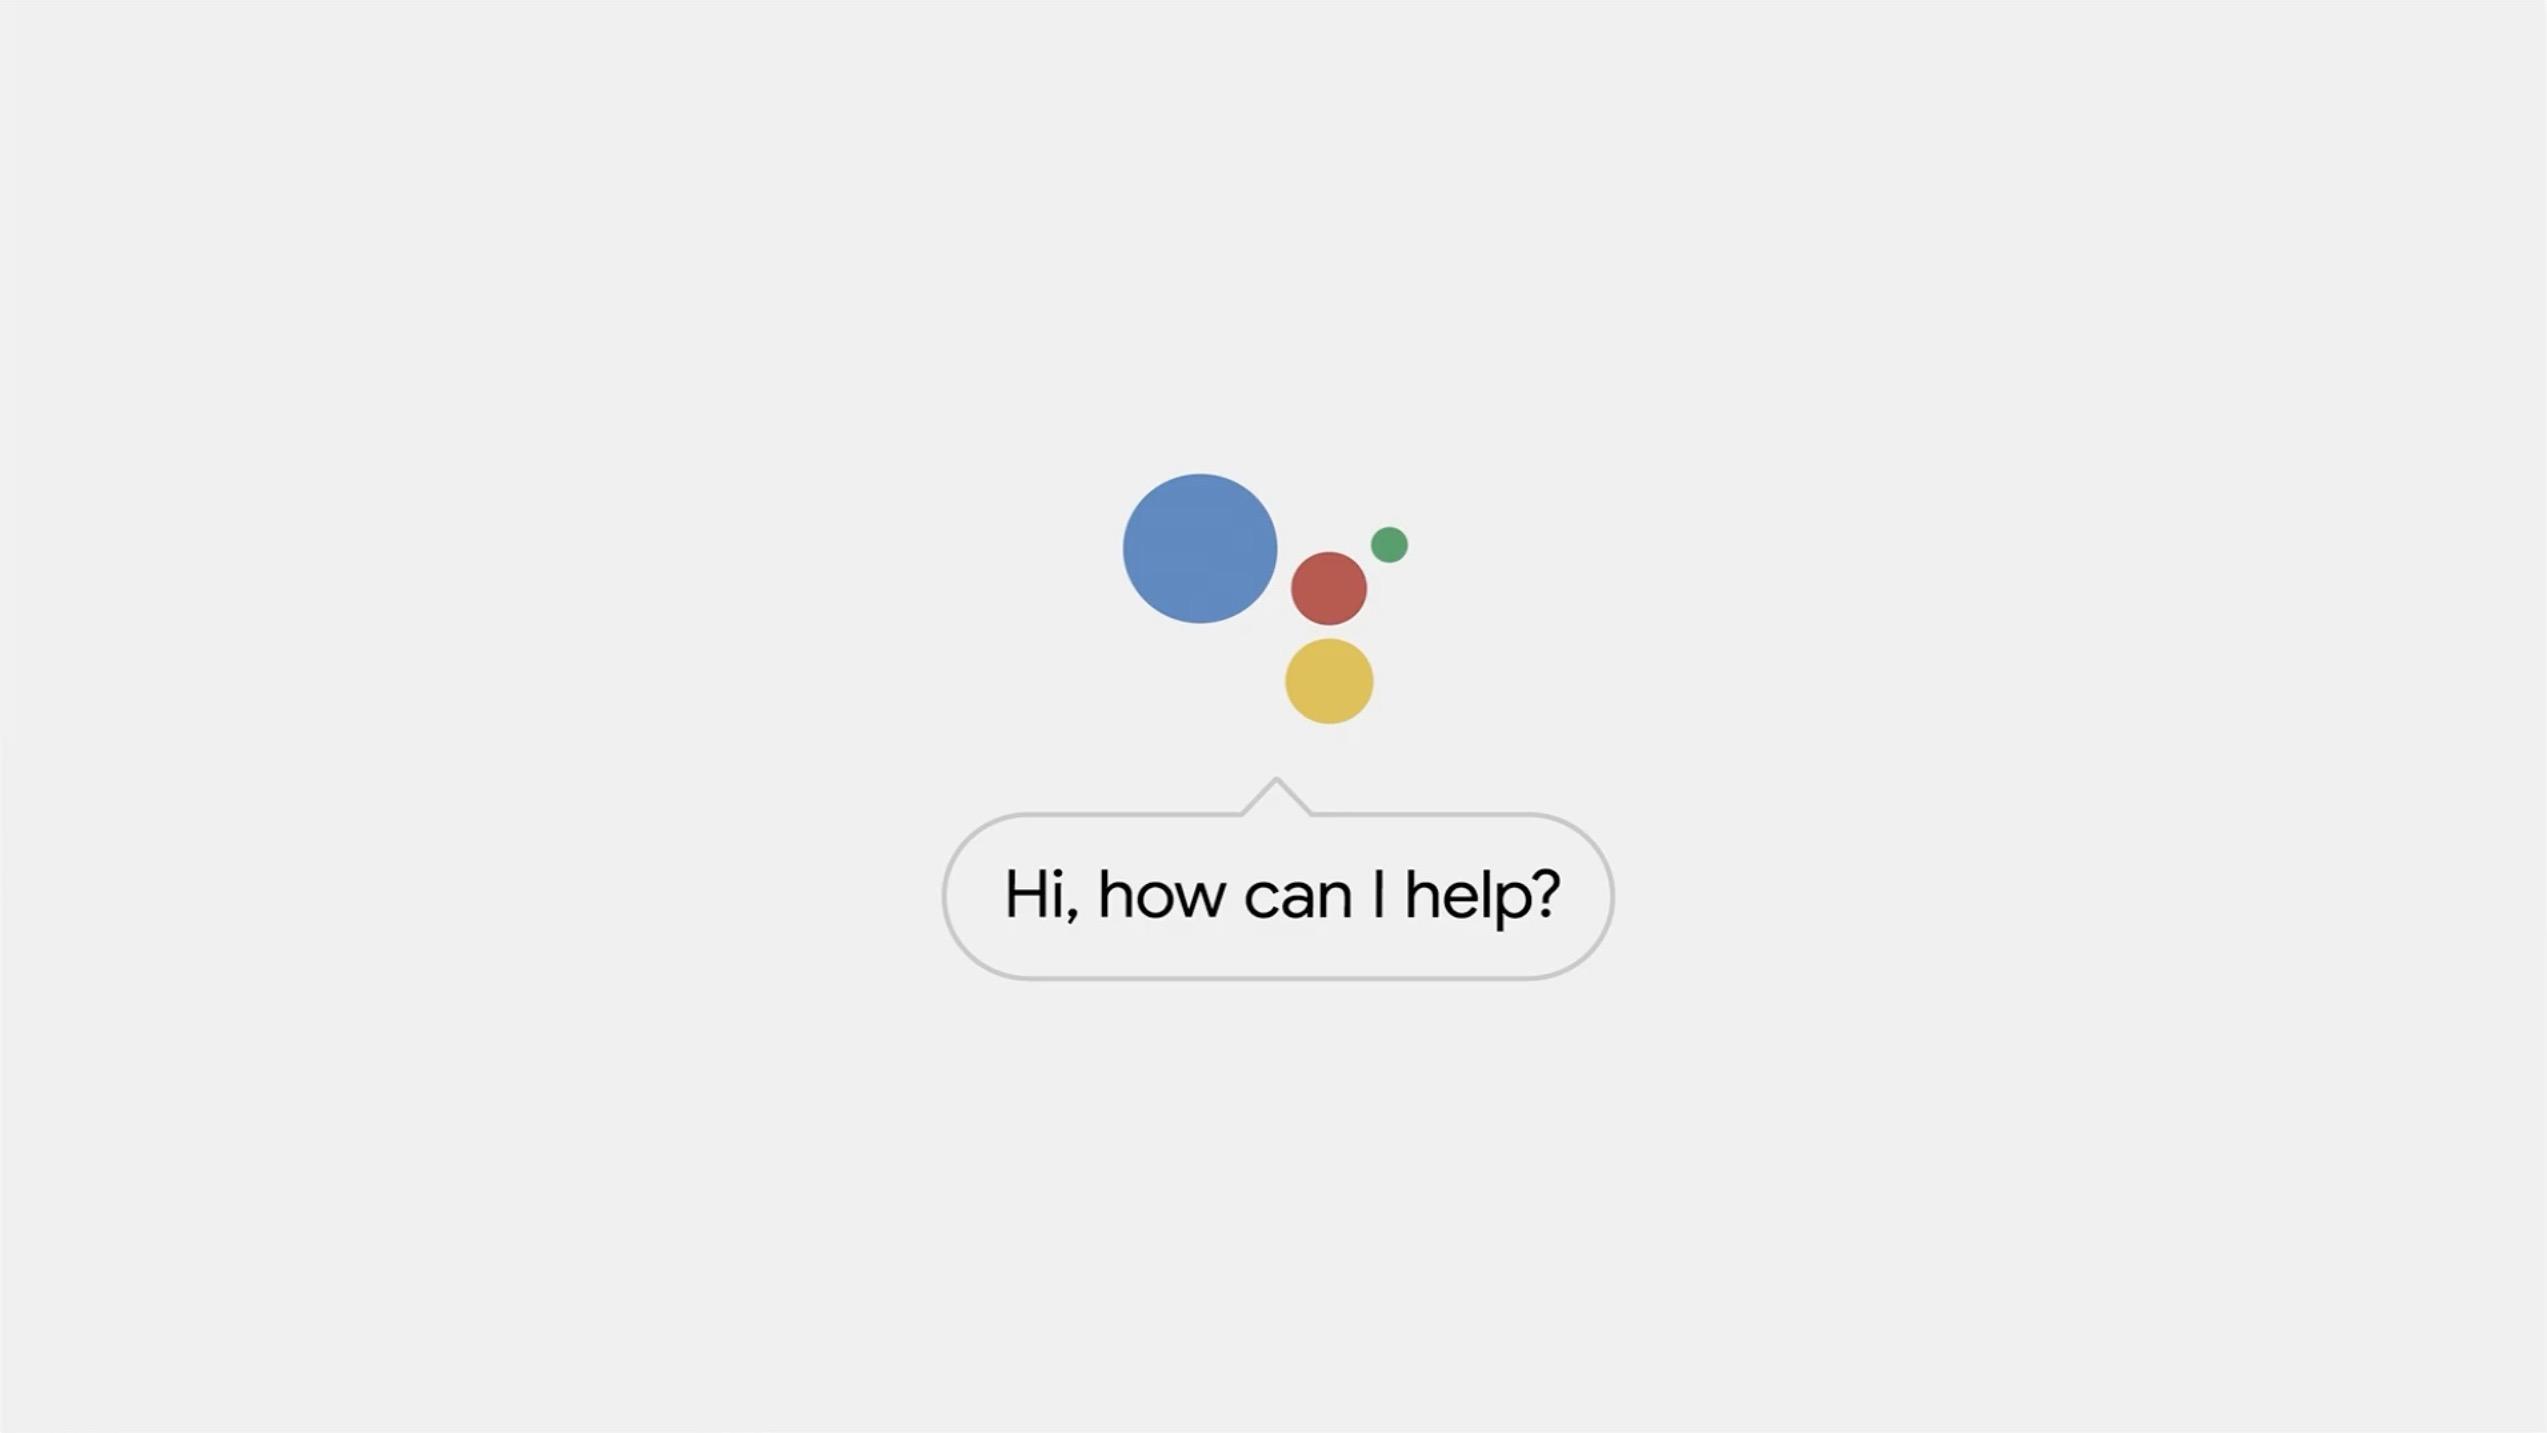 Googleアシスタント、次期バージョンで劇的な高速化を実現〜「Pixel 4」対応も予告